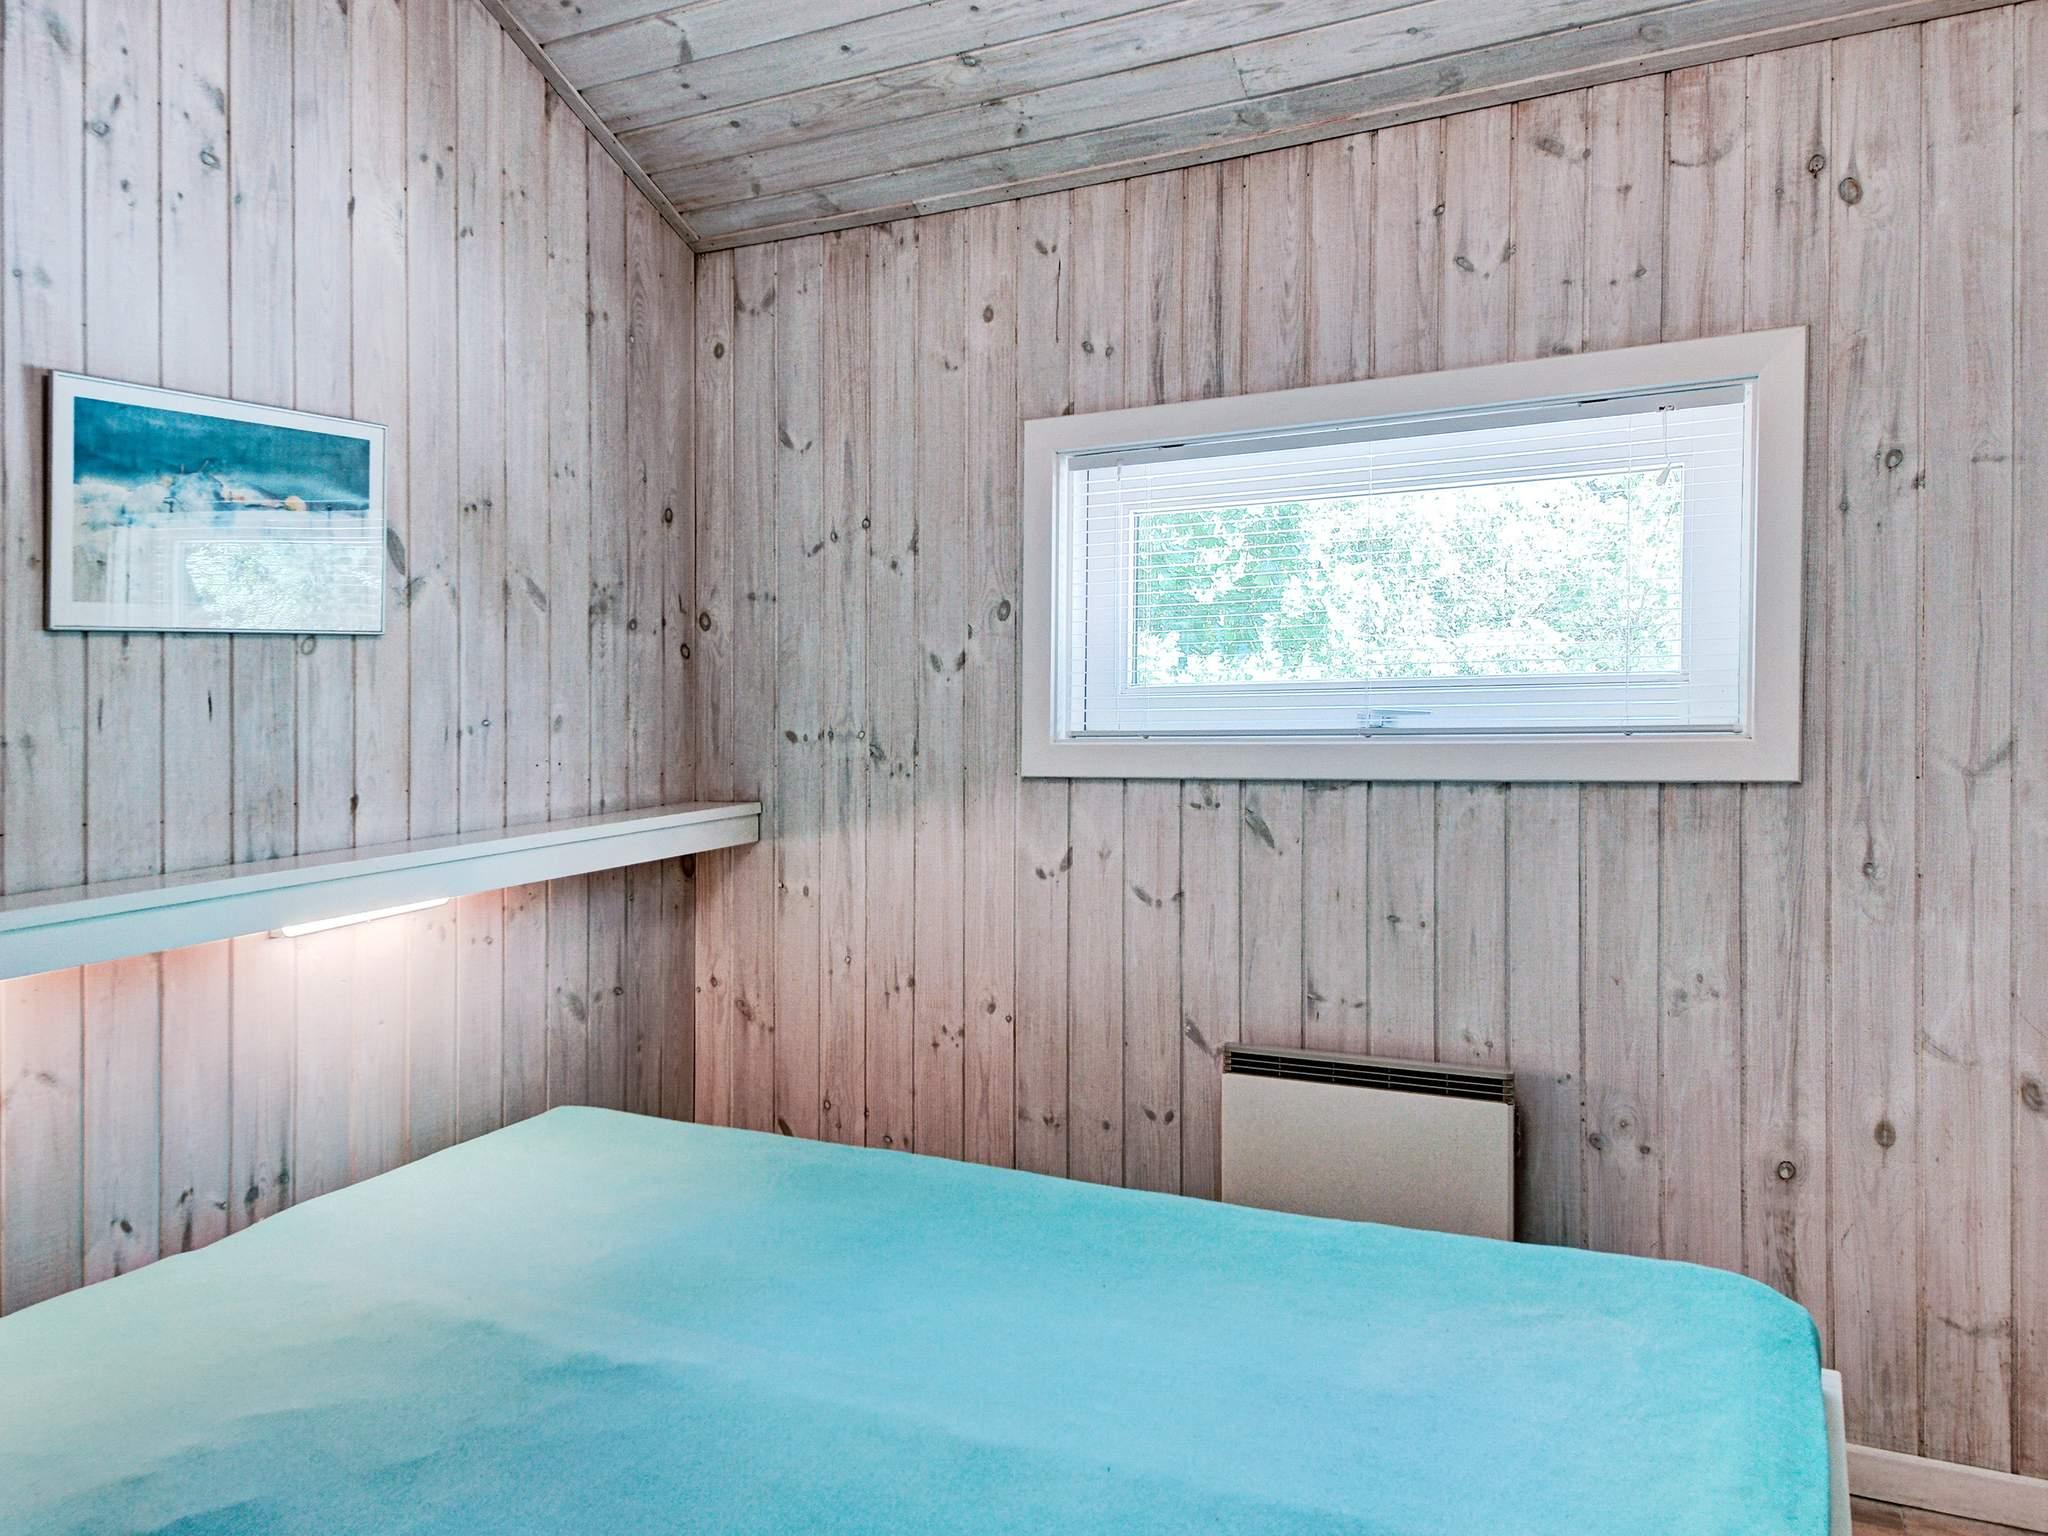 Ferienhaus Sommerodde (82544), Nexø, , Bornholm, Dänemark, Bild 7